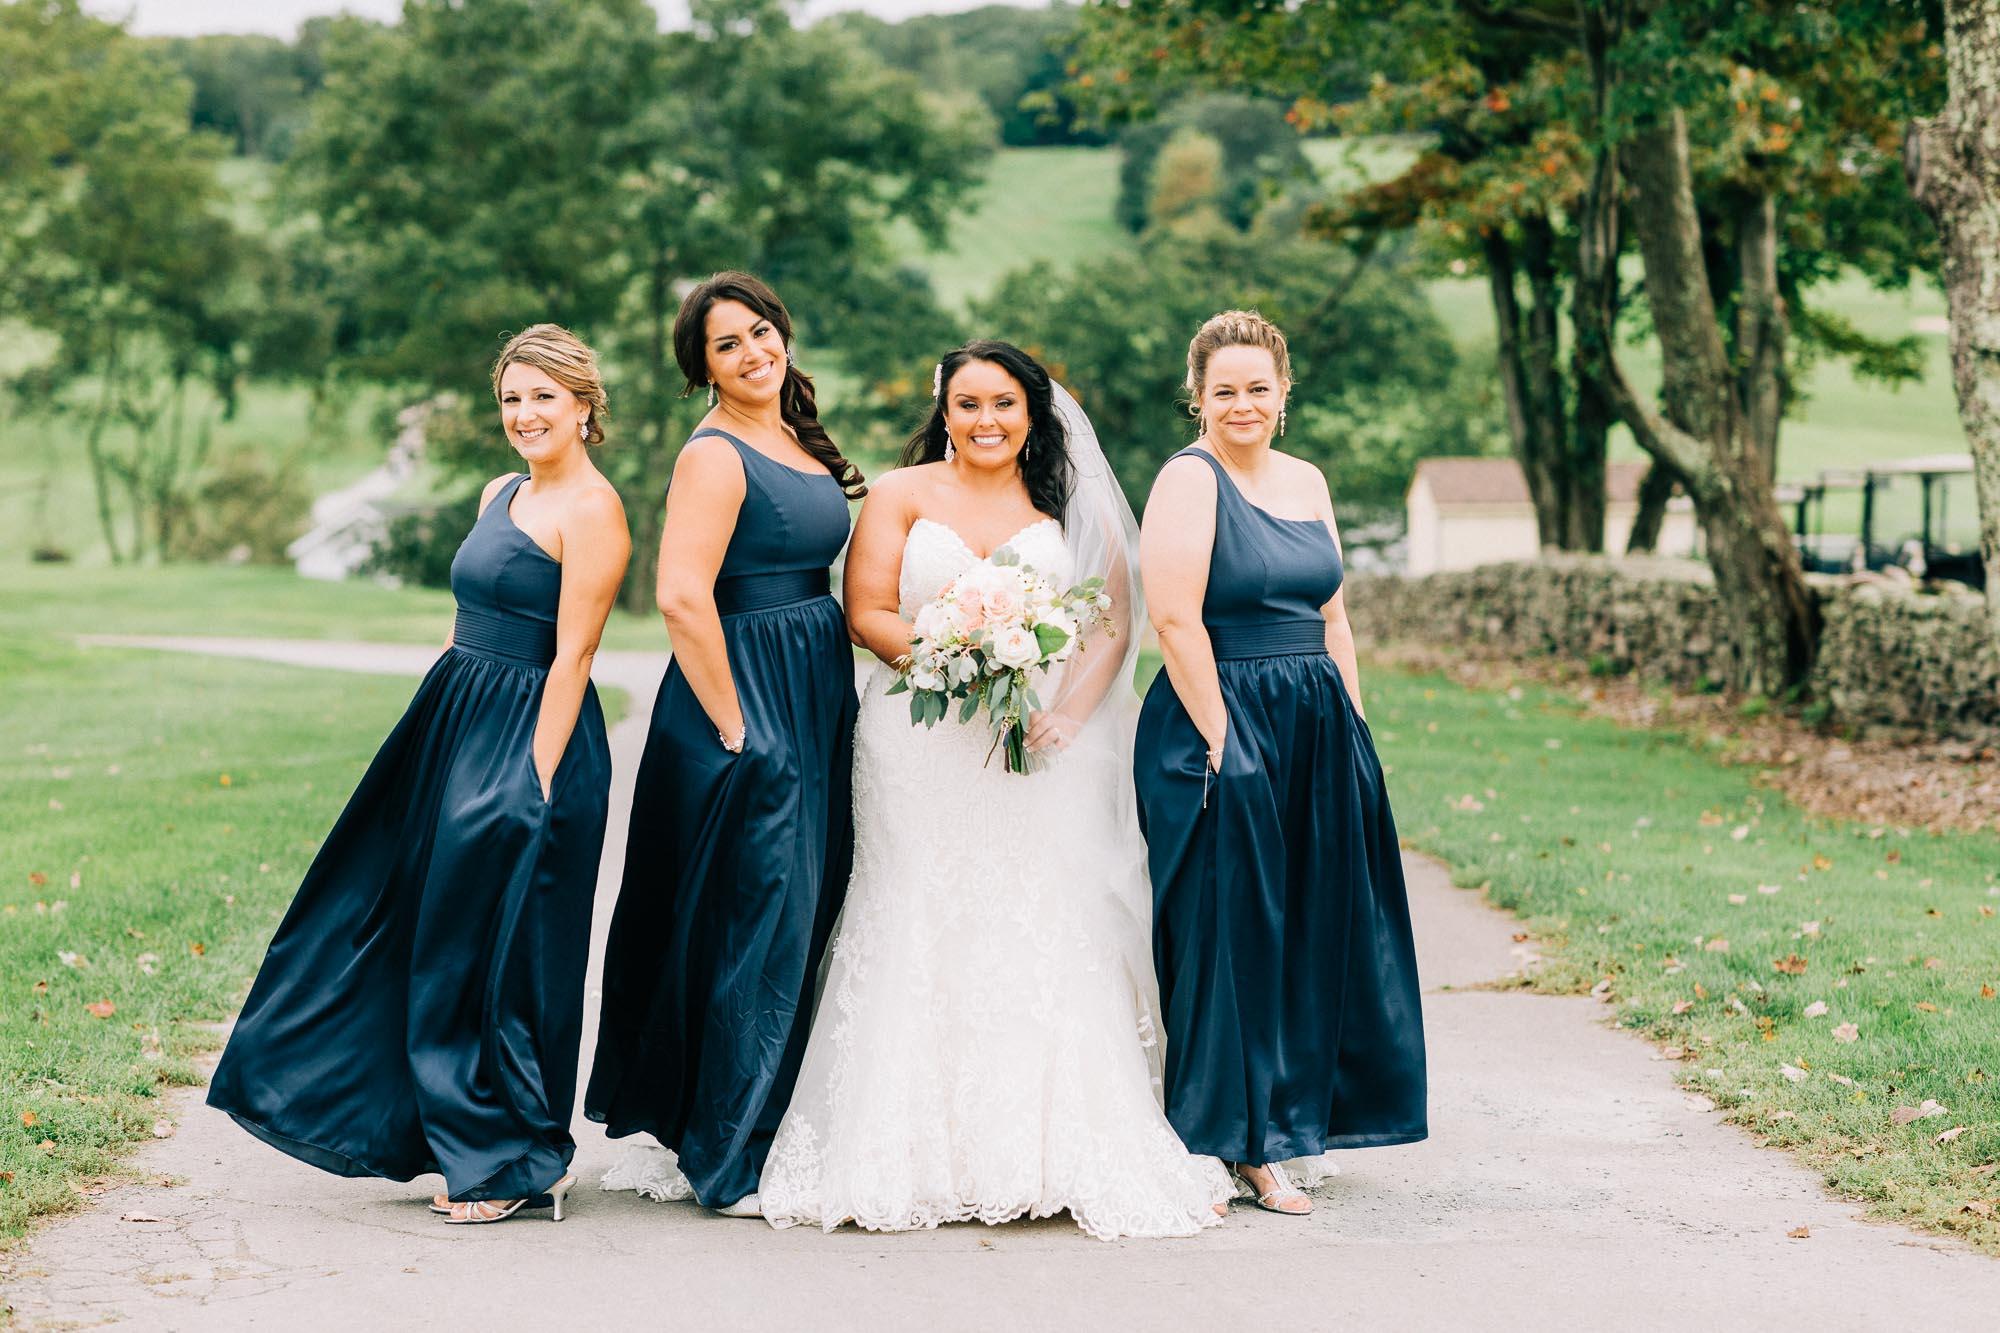 stonhedge-country-club-wedding-8594.jpg